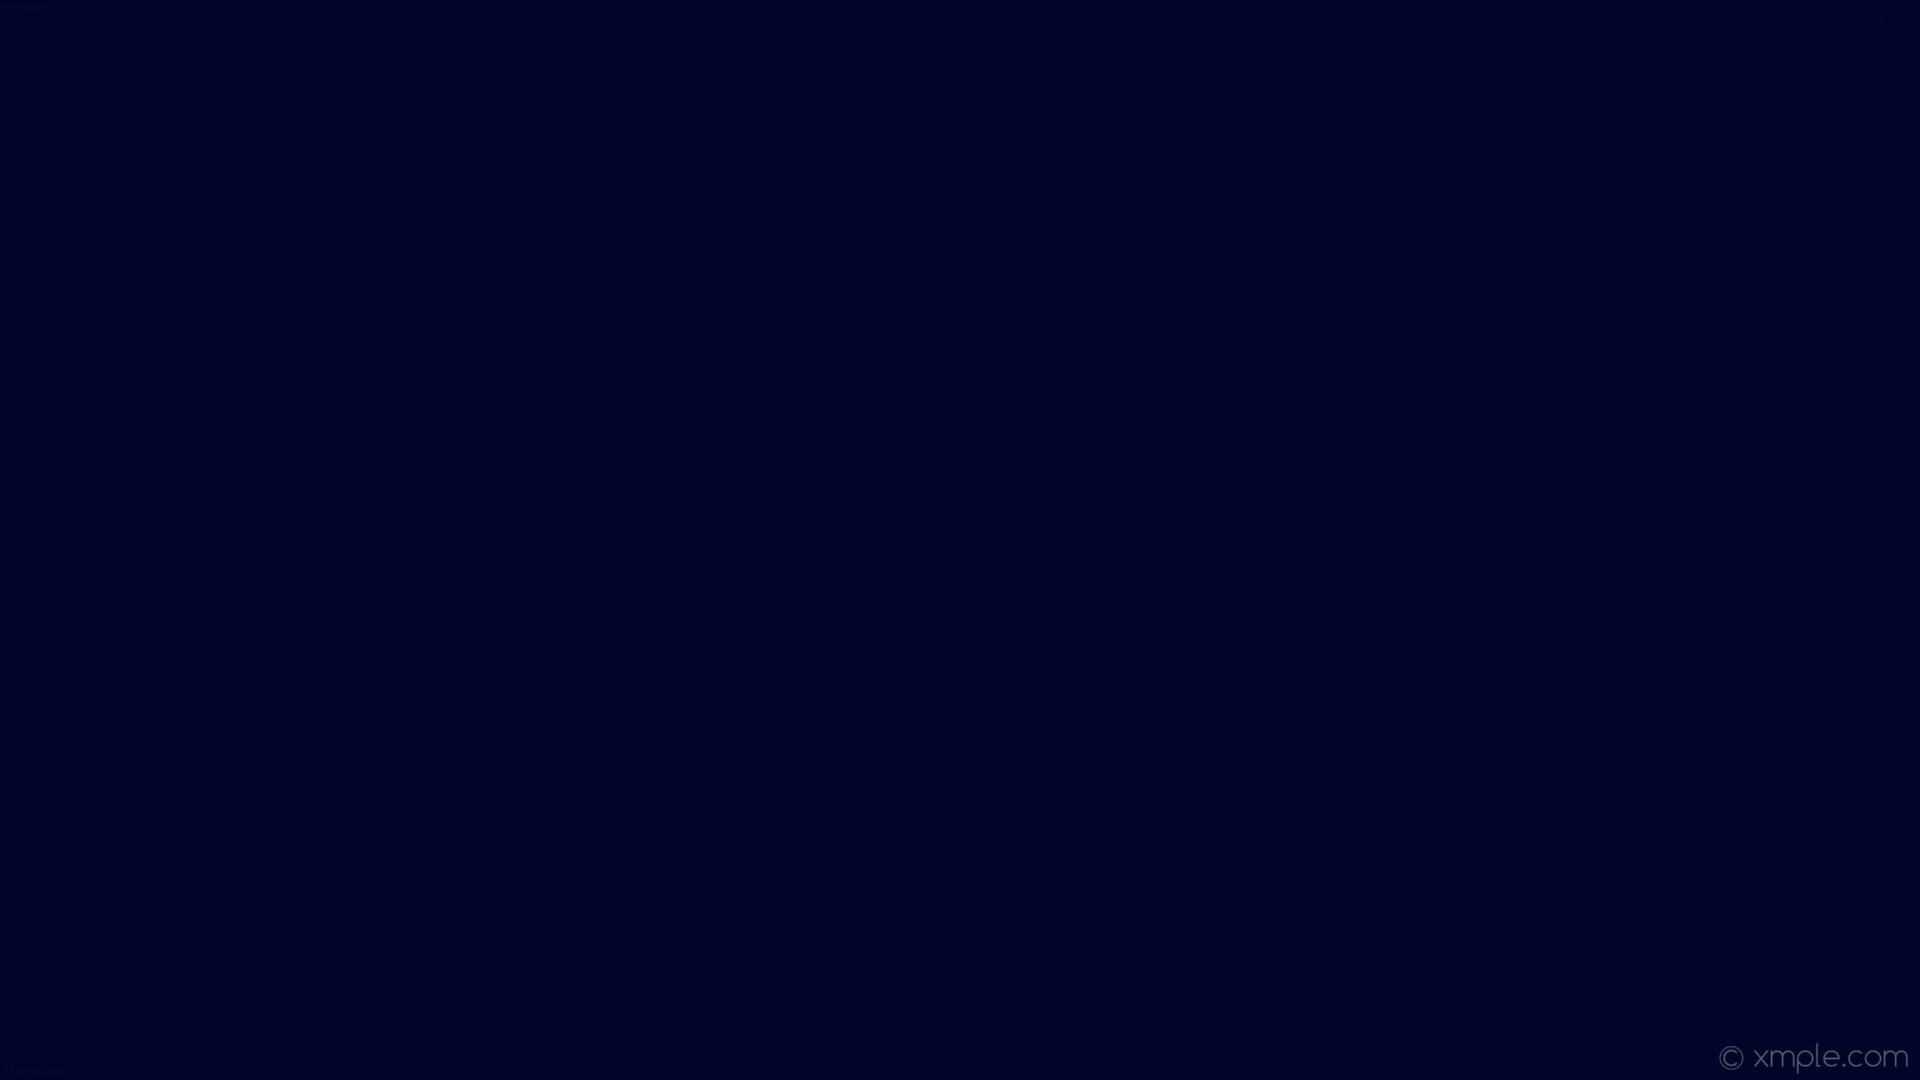 Dark Blue Plain Backgrounds